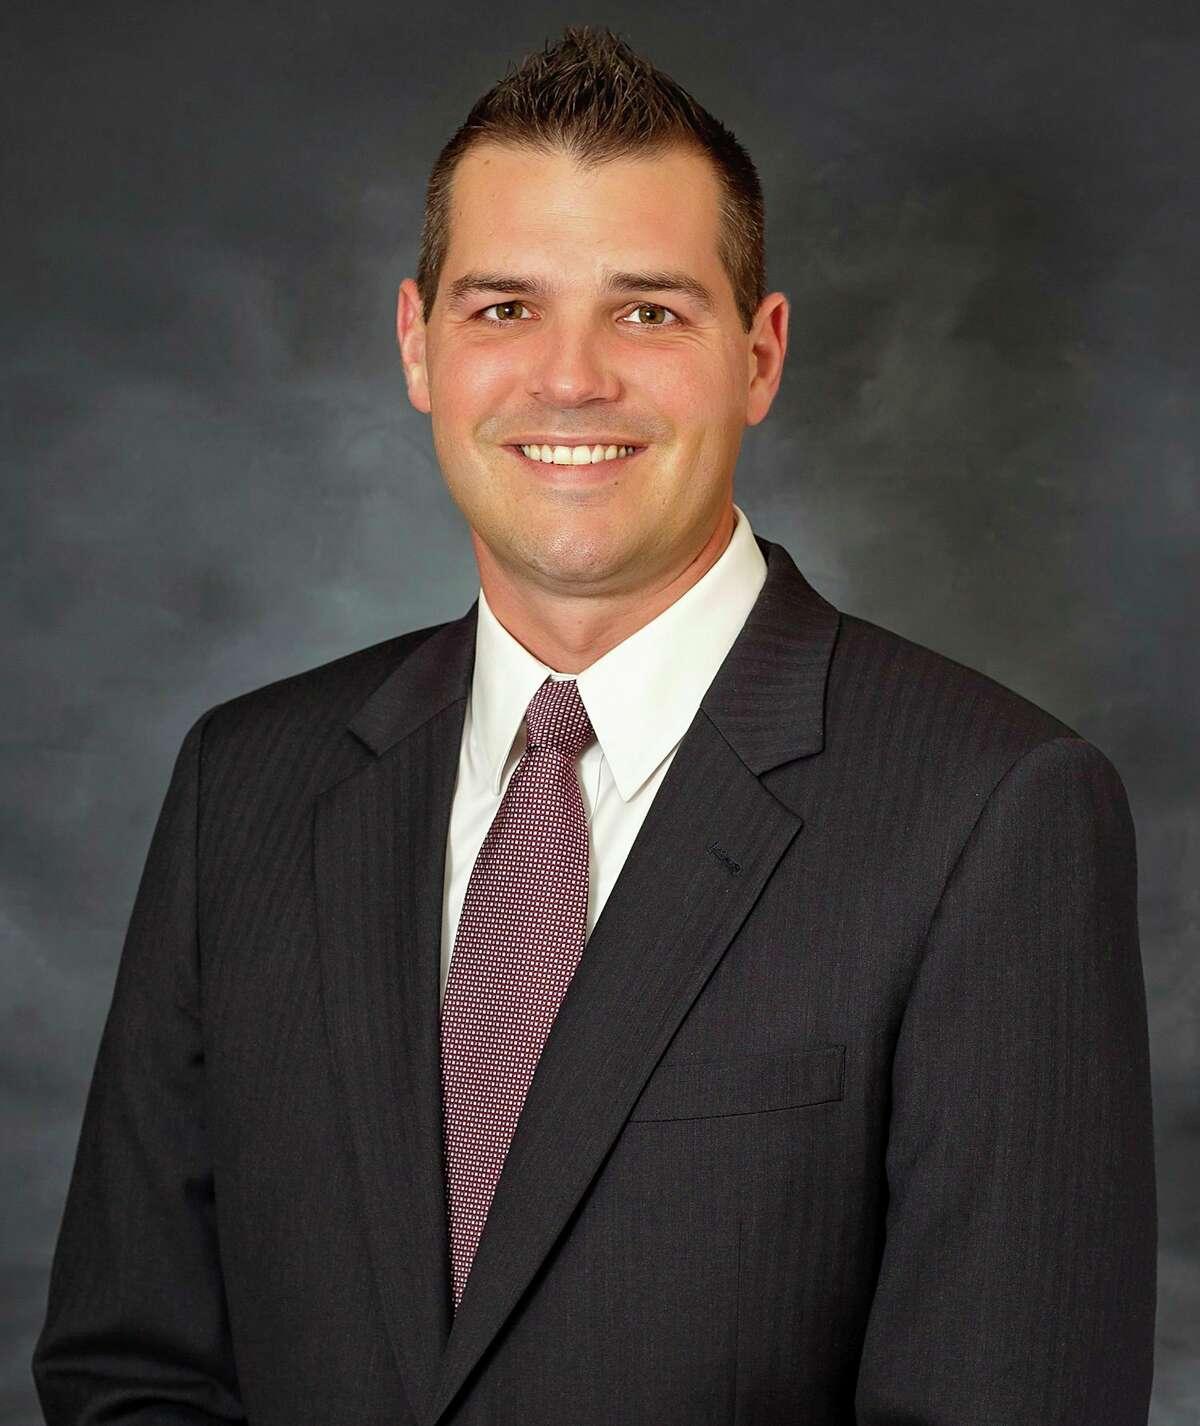 Tyler Schuberg